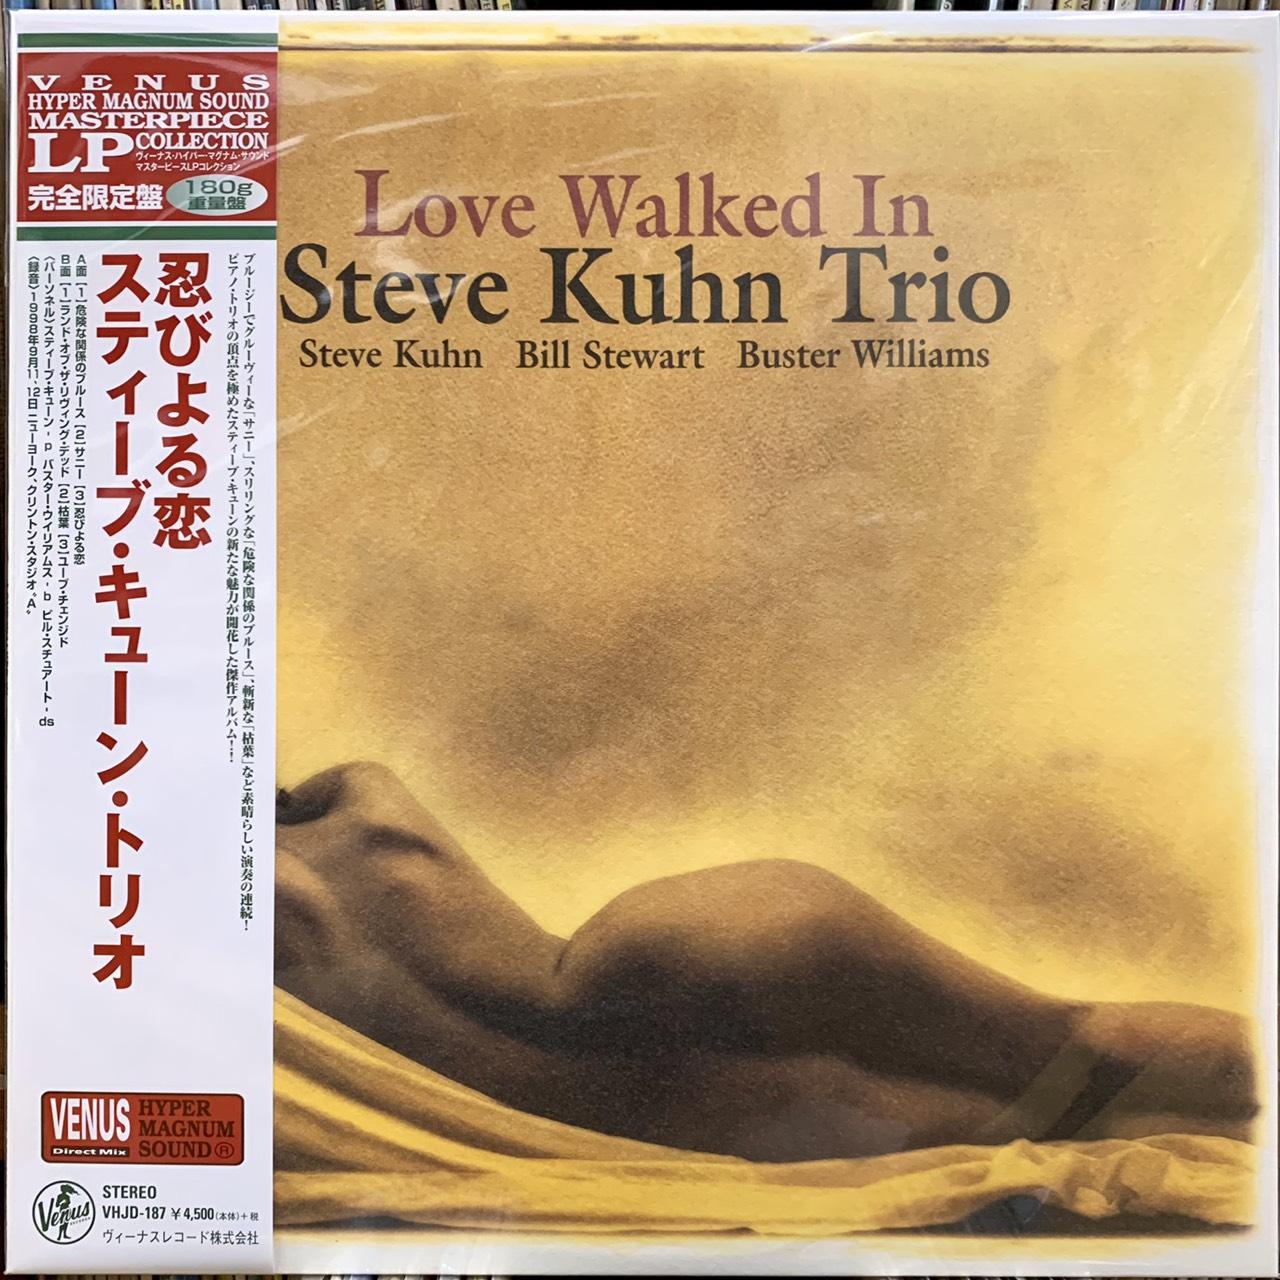 dia-than-vinyl-love-walked-in-steve-kuhn-trio